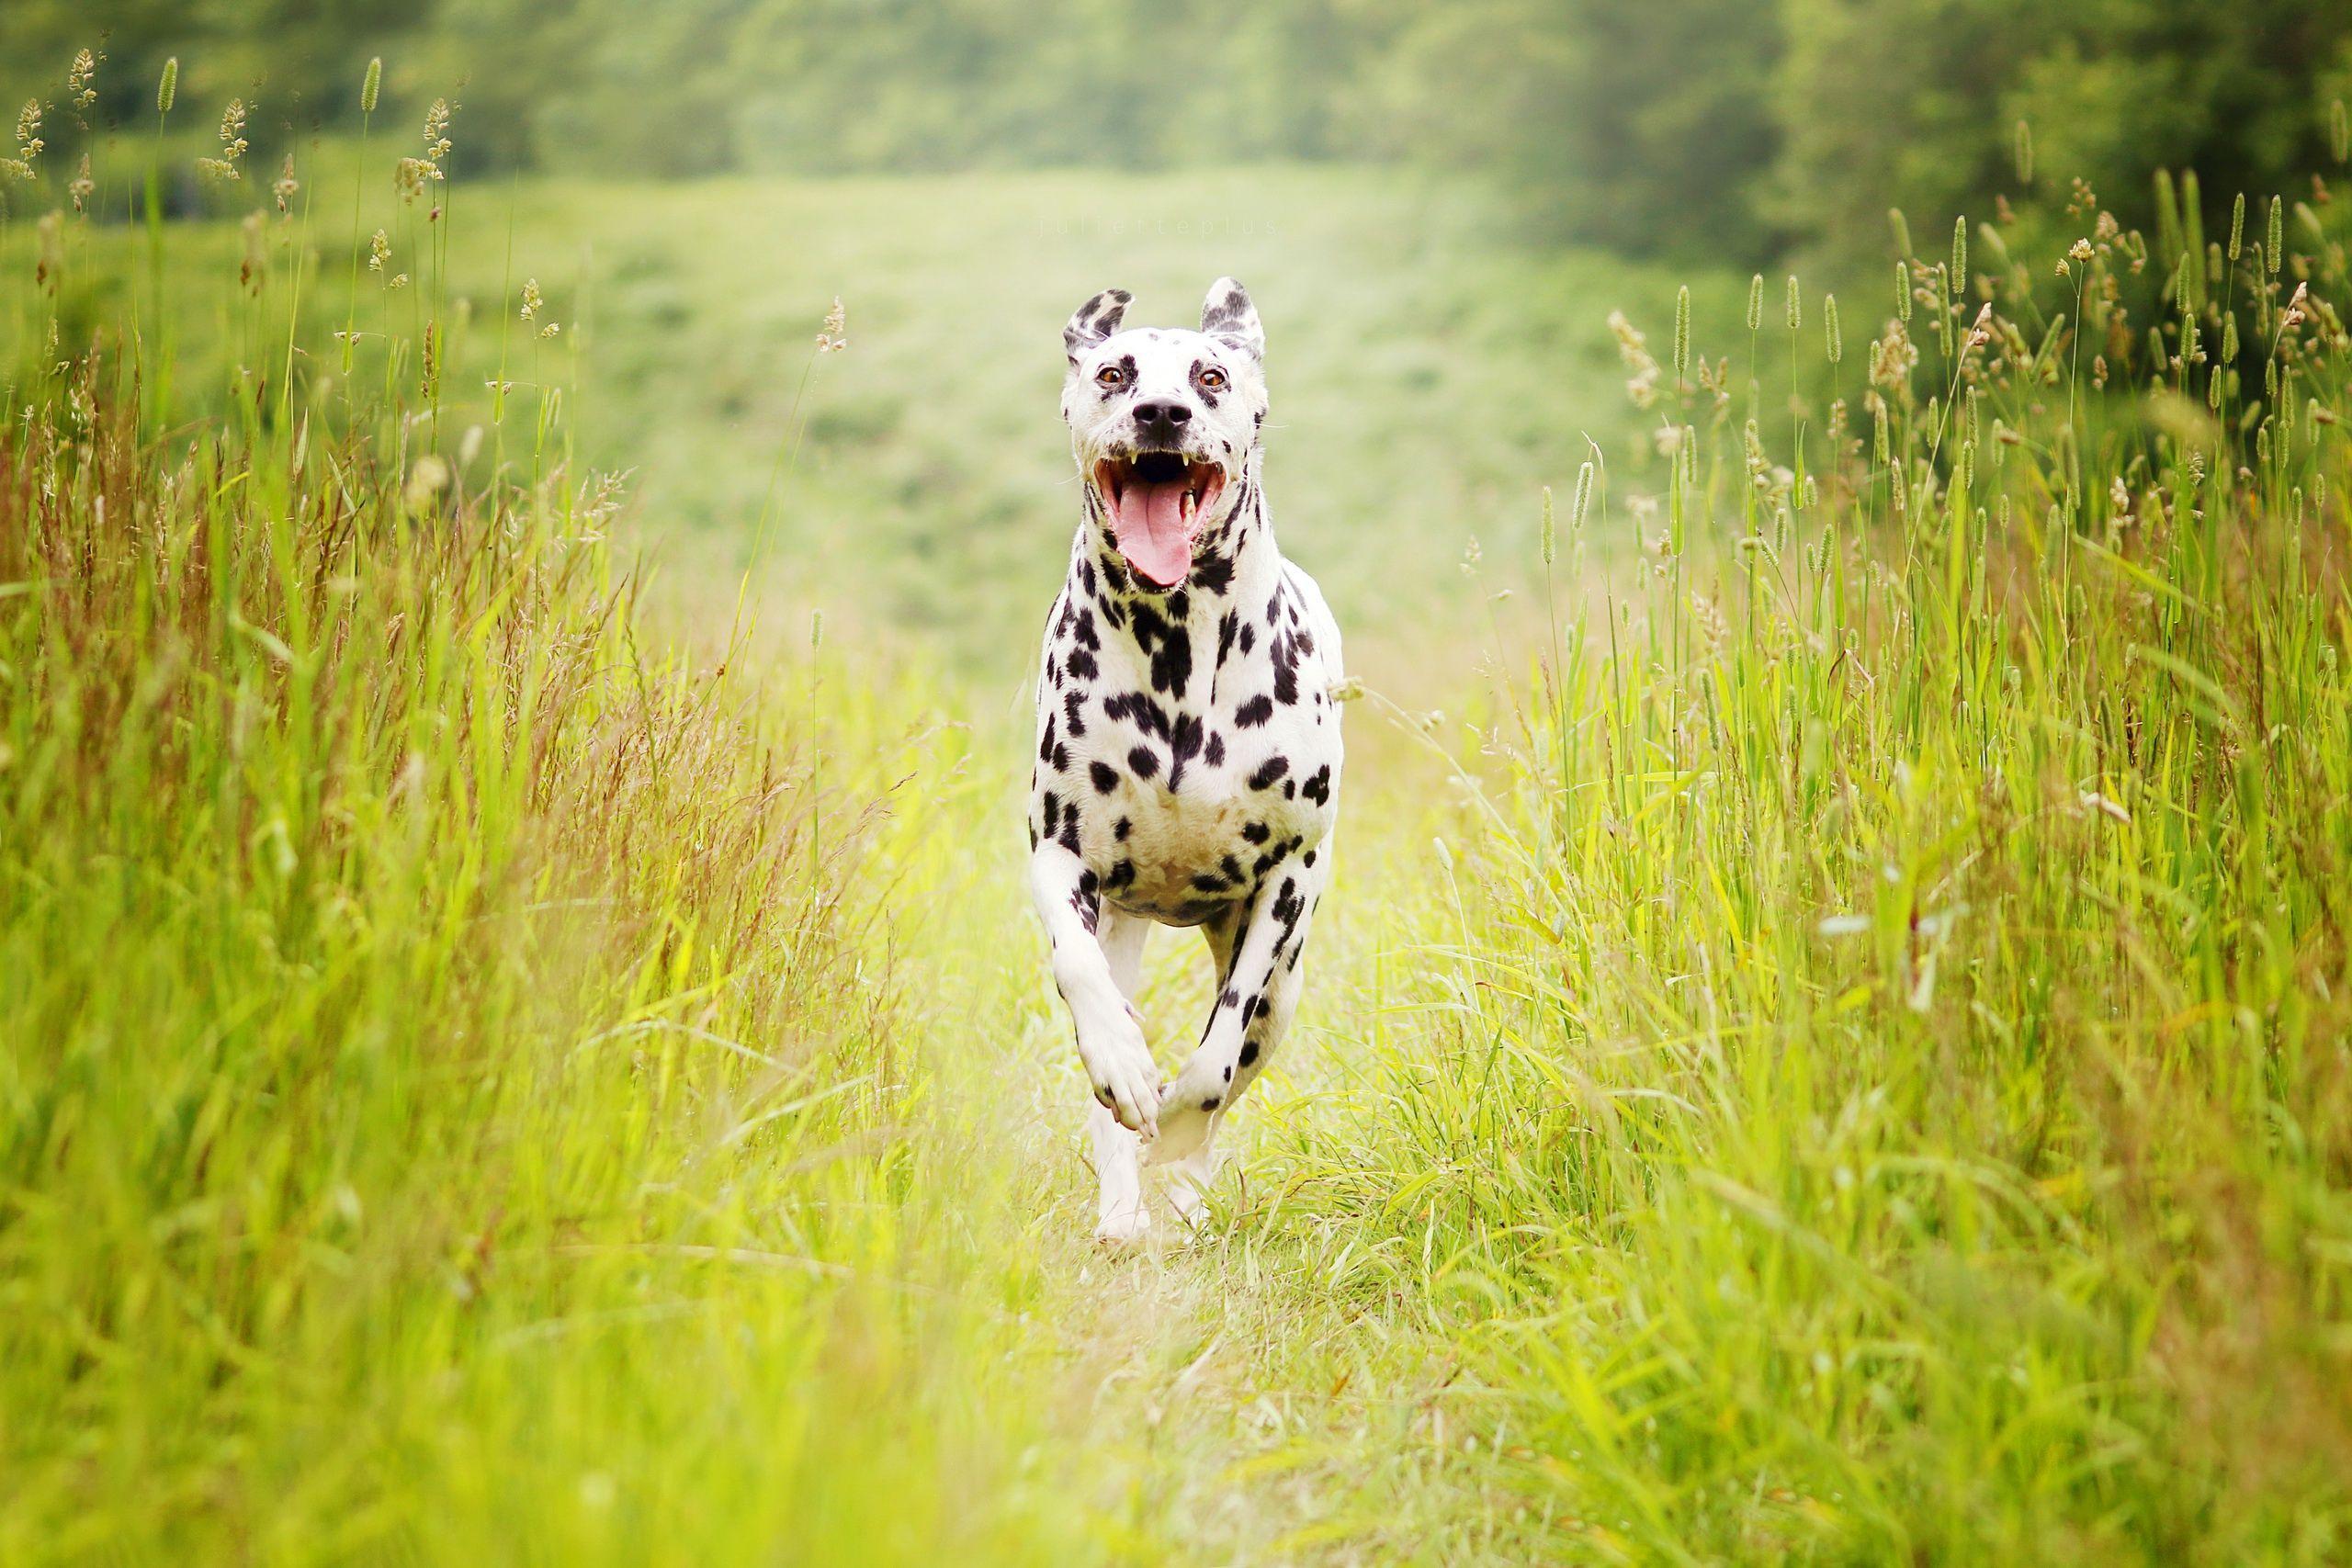 Dalmatian Wallpapers - Top Free Dalmatian Backgrounds ...